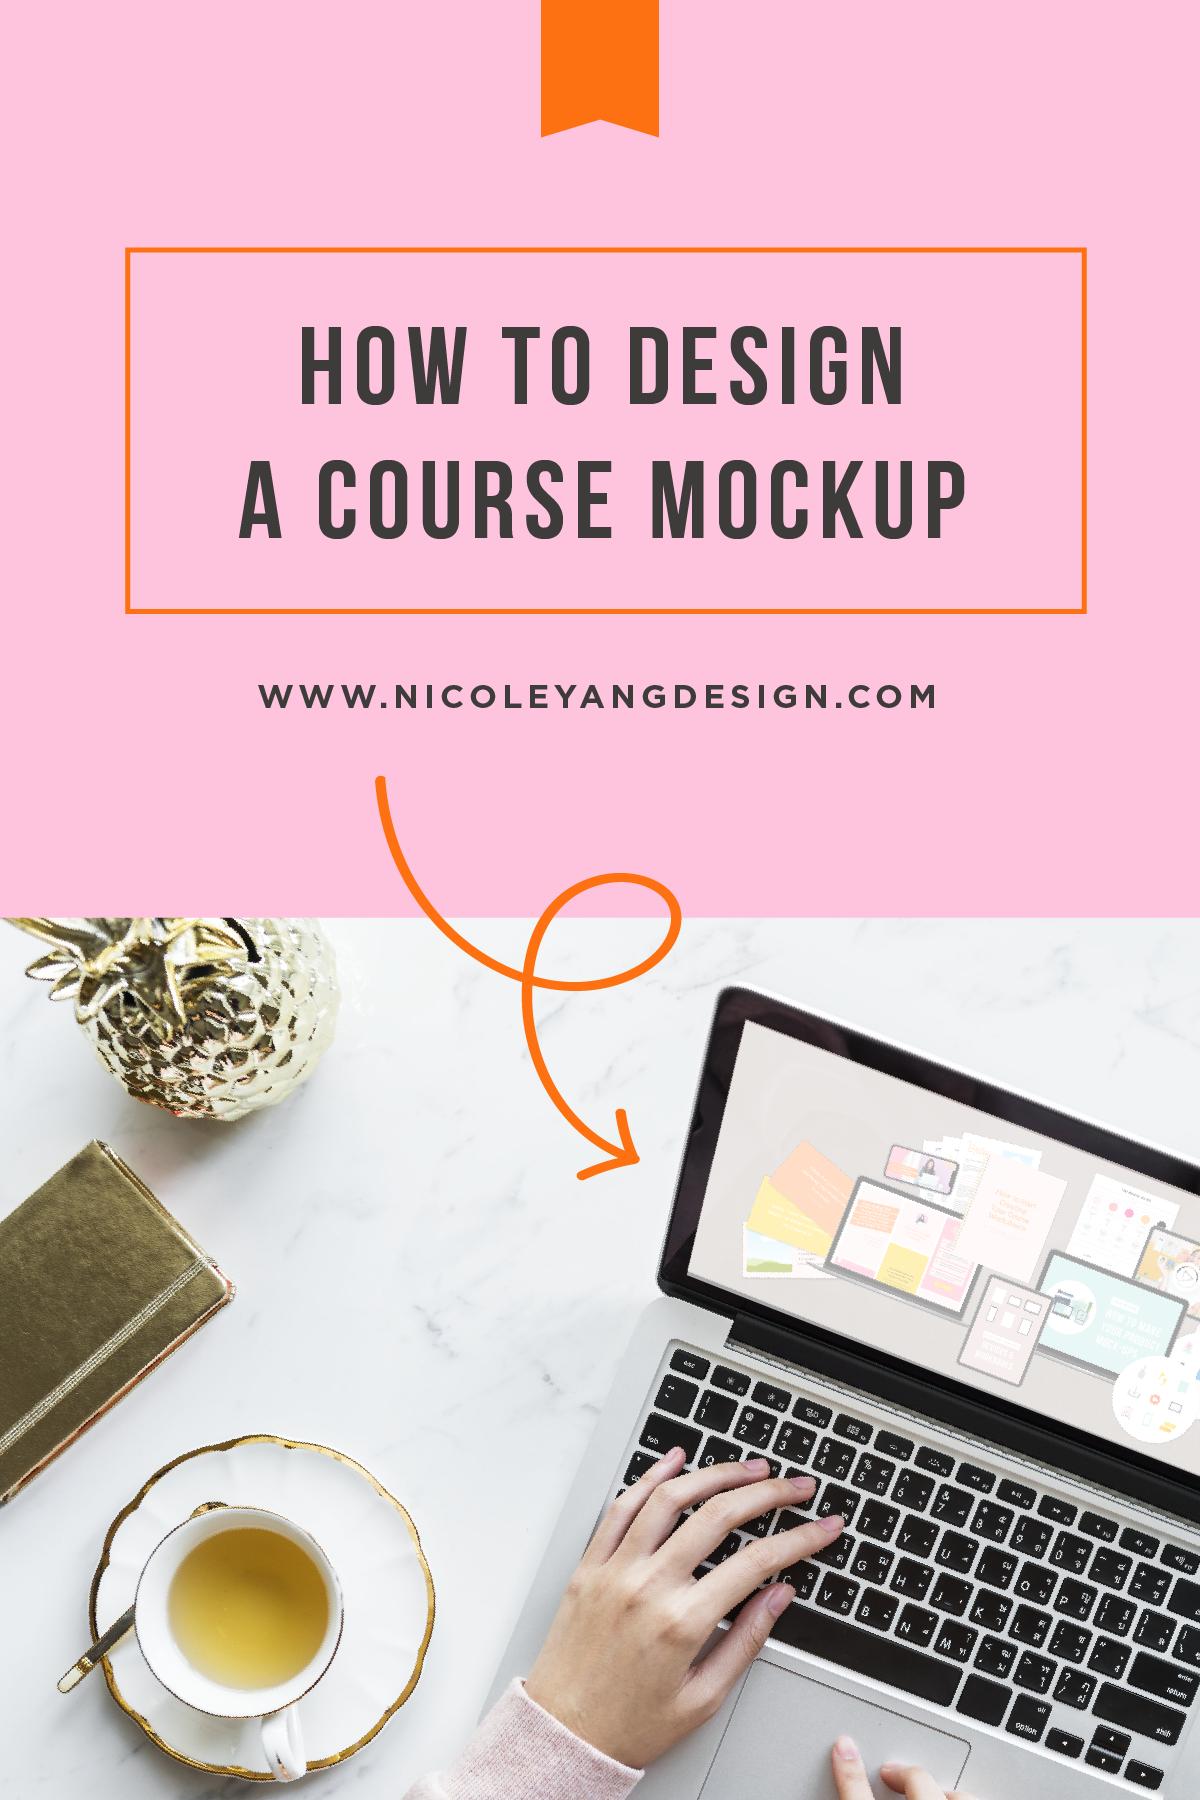 How To Make A Course Mockup Photoshop Design Diy Courses Design Lab